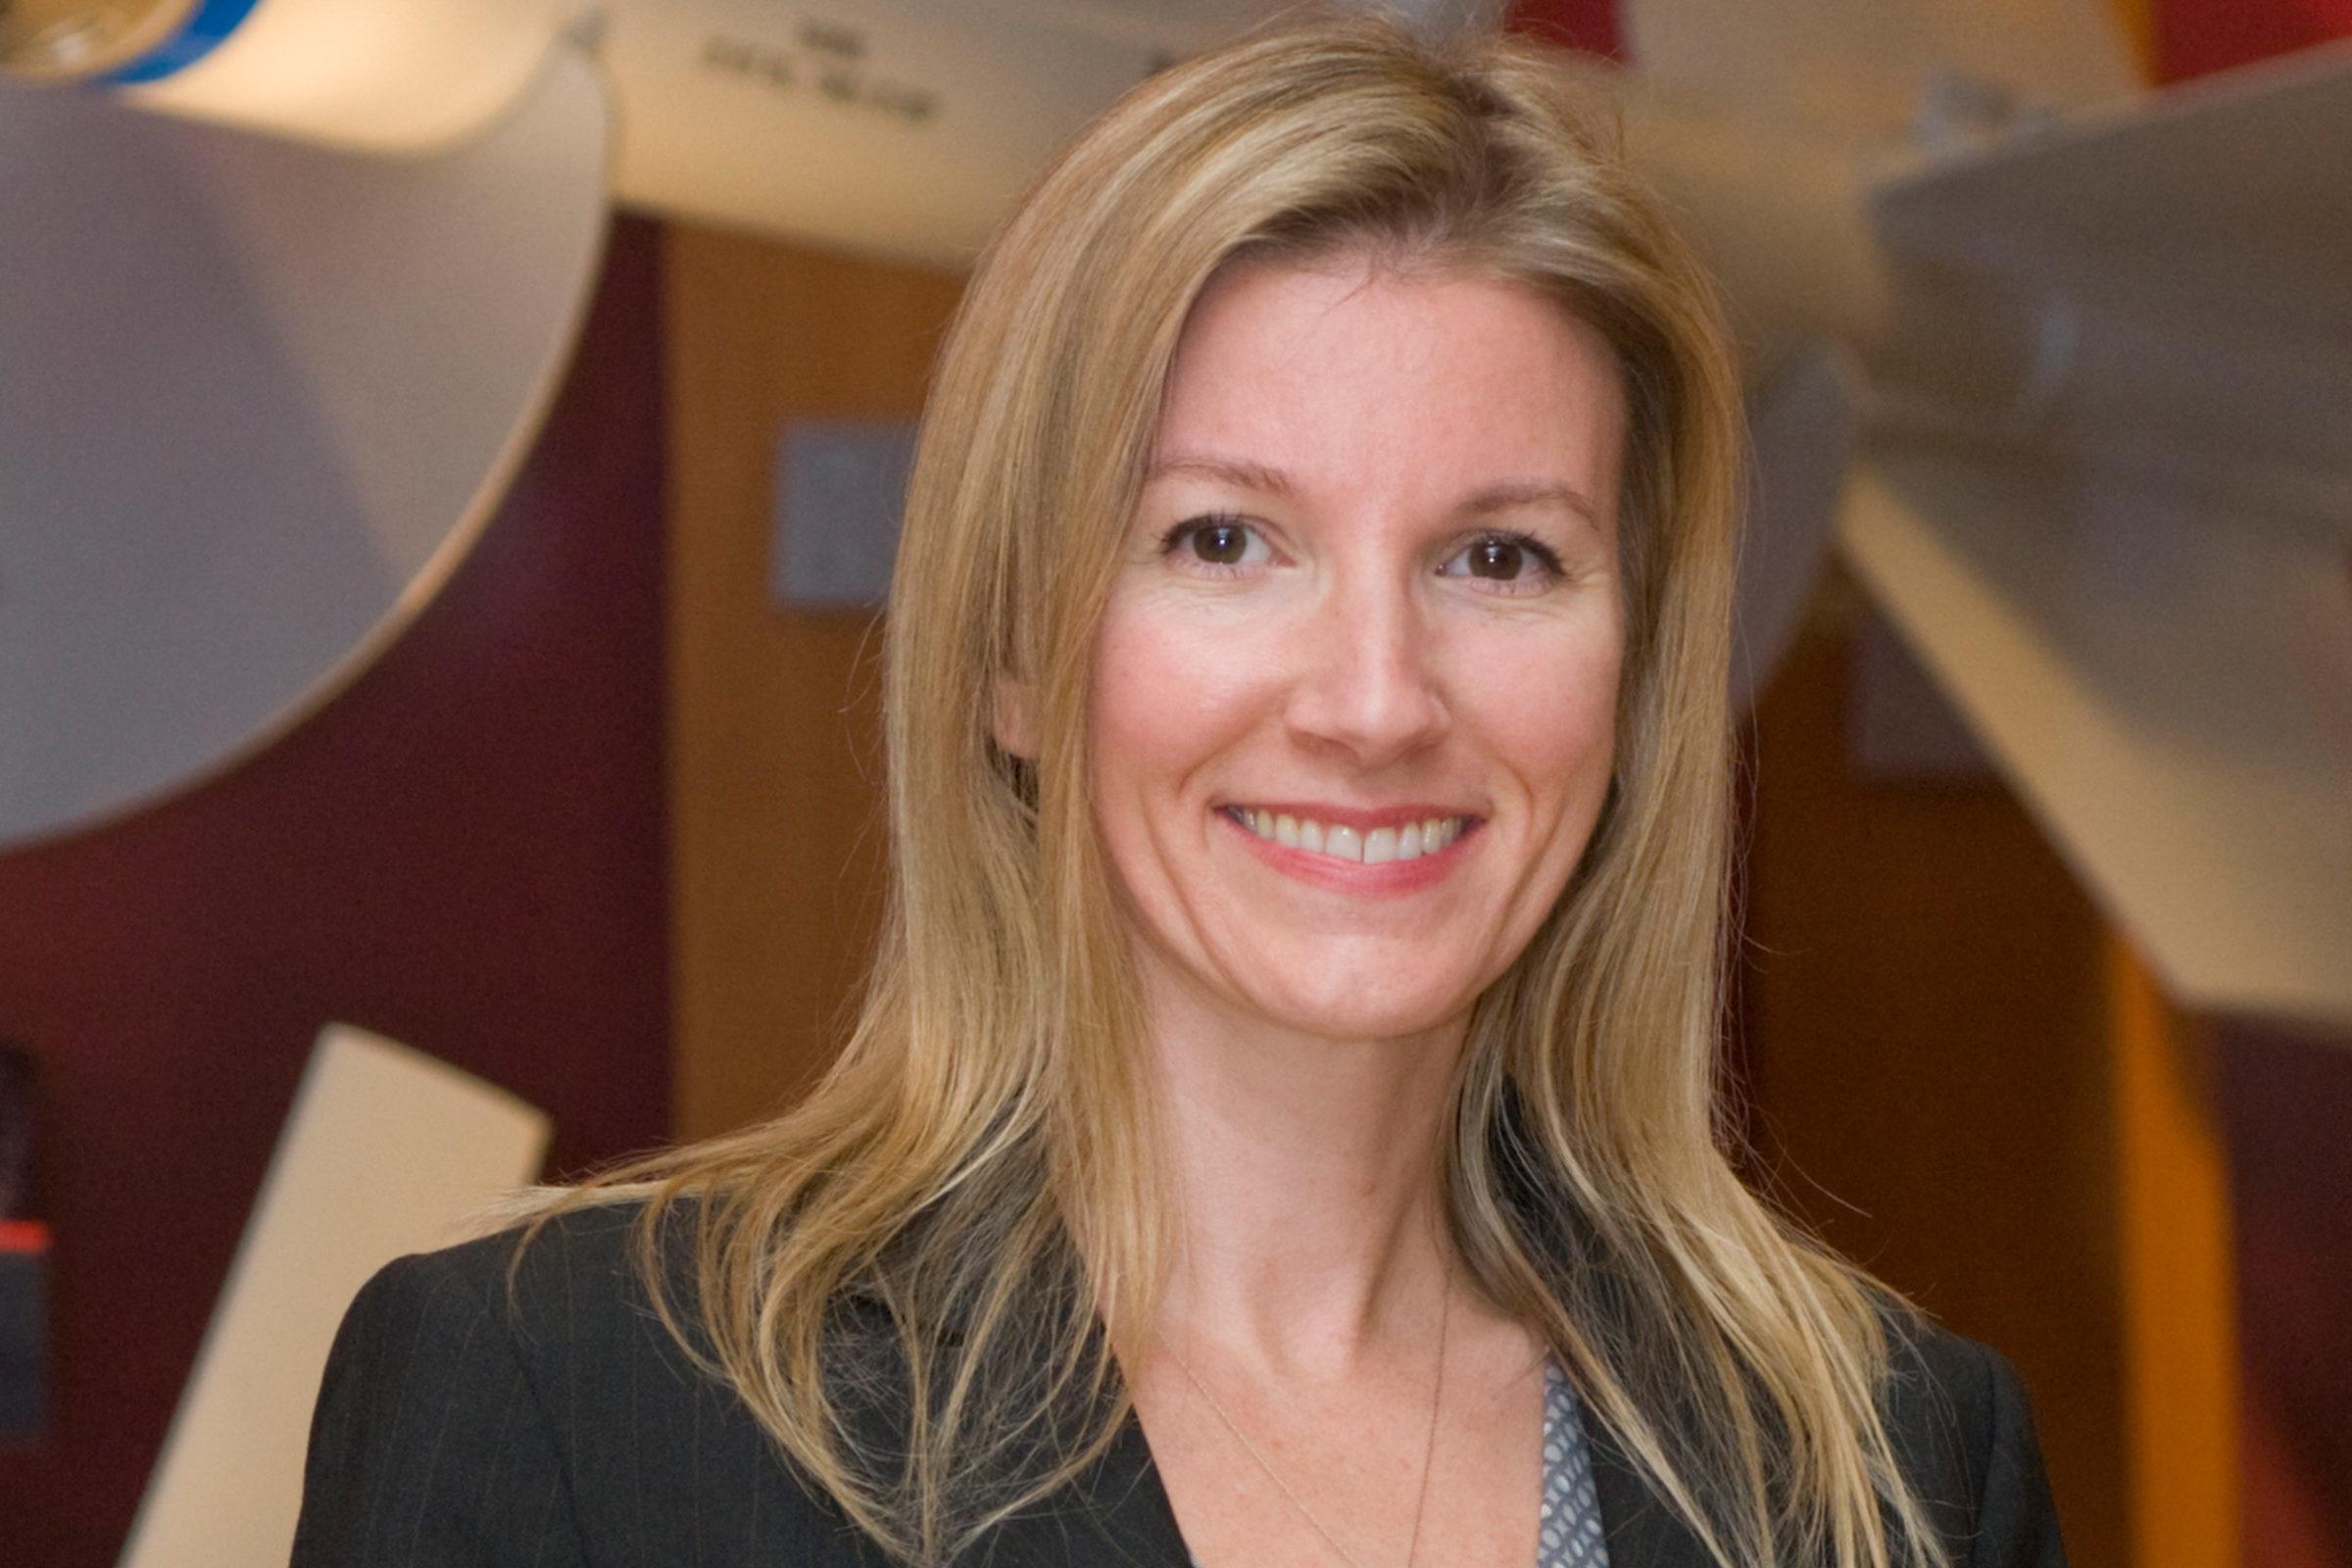 A Role Model at Raytheon: Katherine Herrick